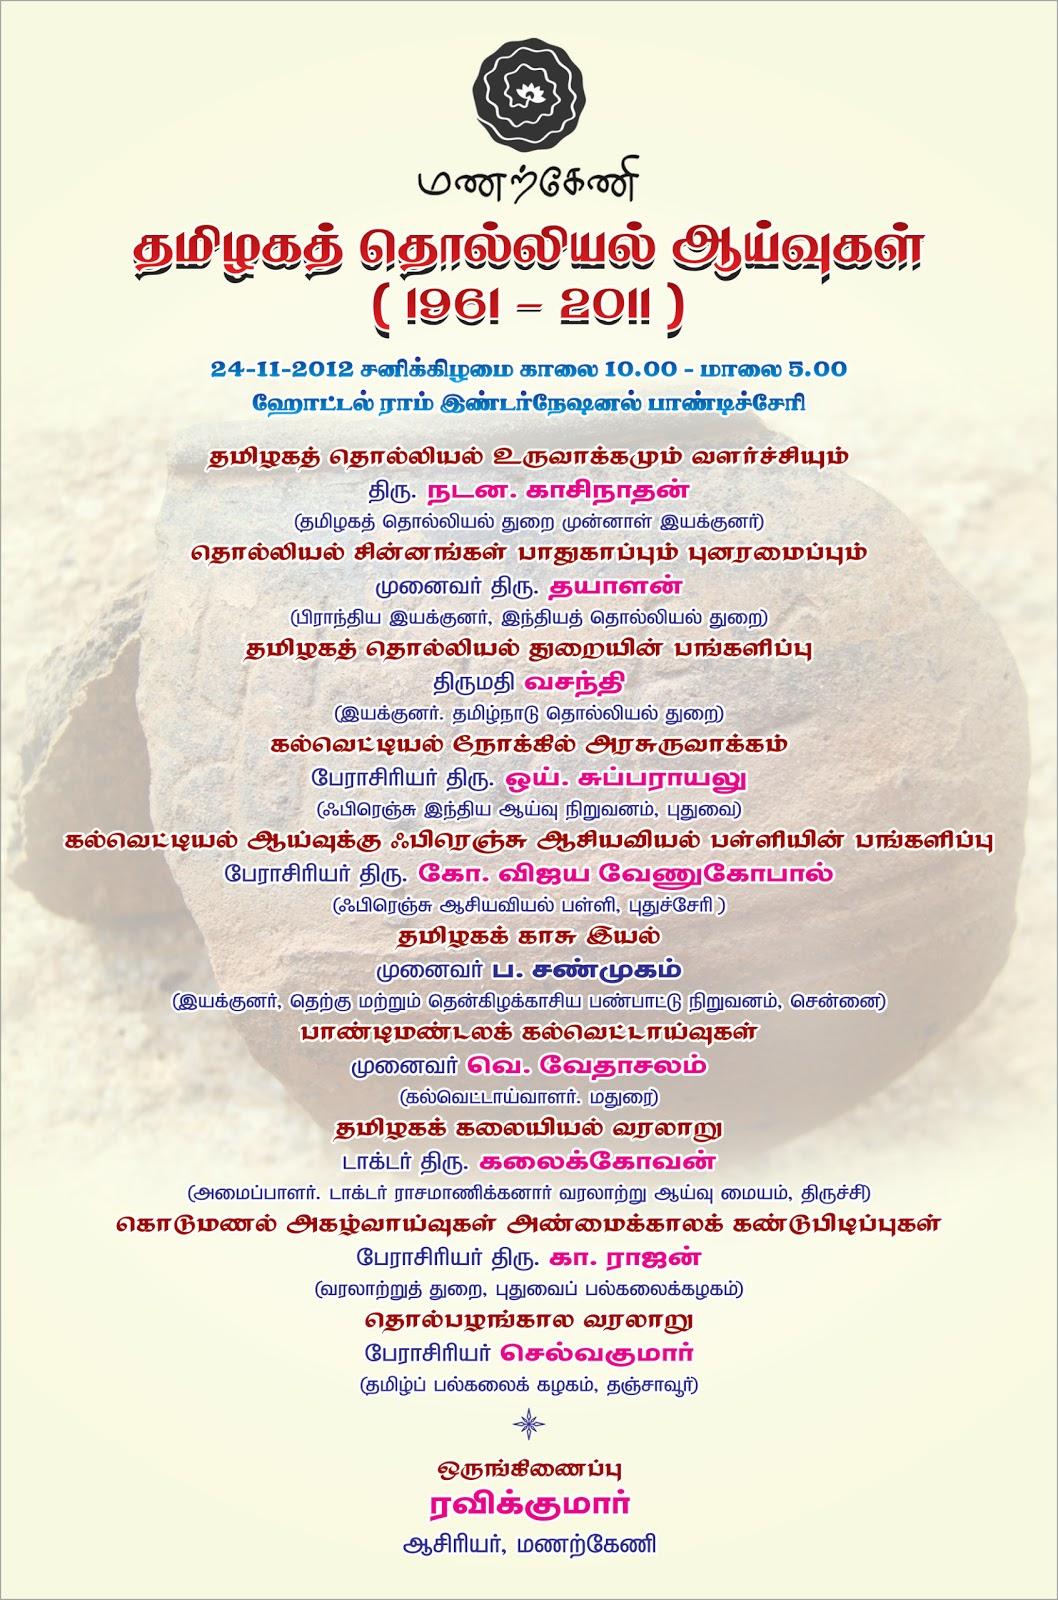 http://3.bp.blogspot.com/-cbRnKFftC6Q/UK0Yrio1sHI/AAAAAAAABFE/17WB0Wmzl9A/s1600/Tamil+Tholliyal.jpg